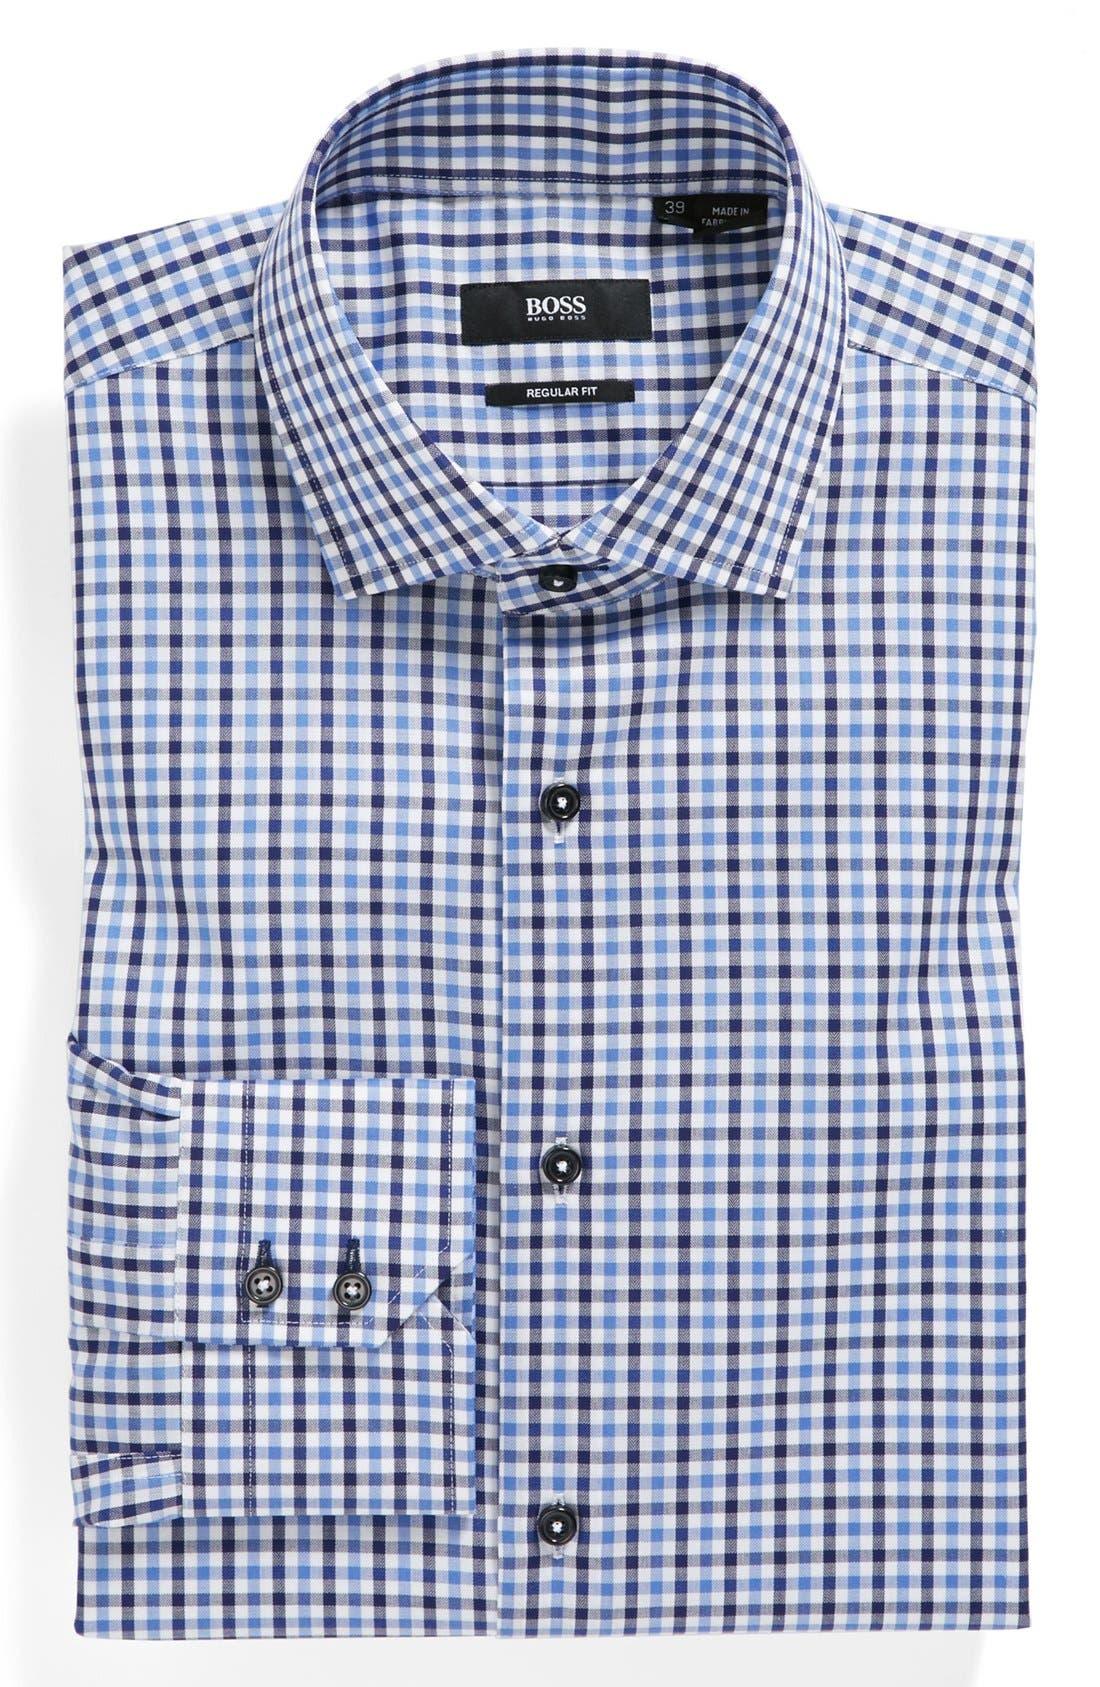 Alternate Image 1 Selected - BOSS HUGO BOSS 'Gorman' WW Regular Fit Dress Shirt